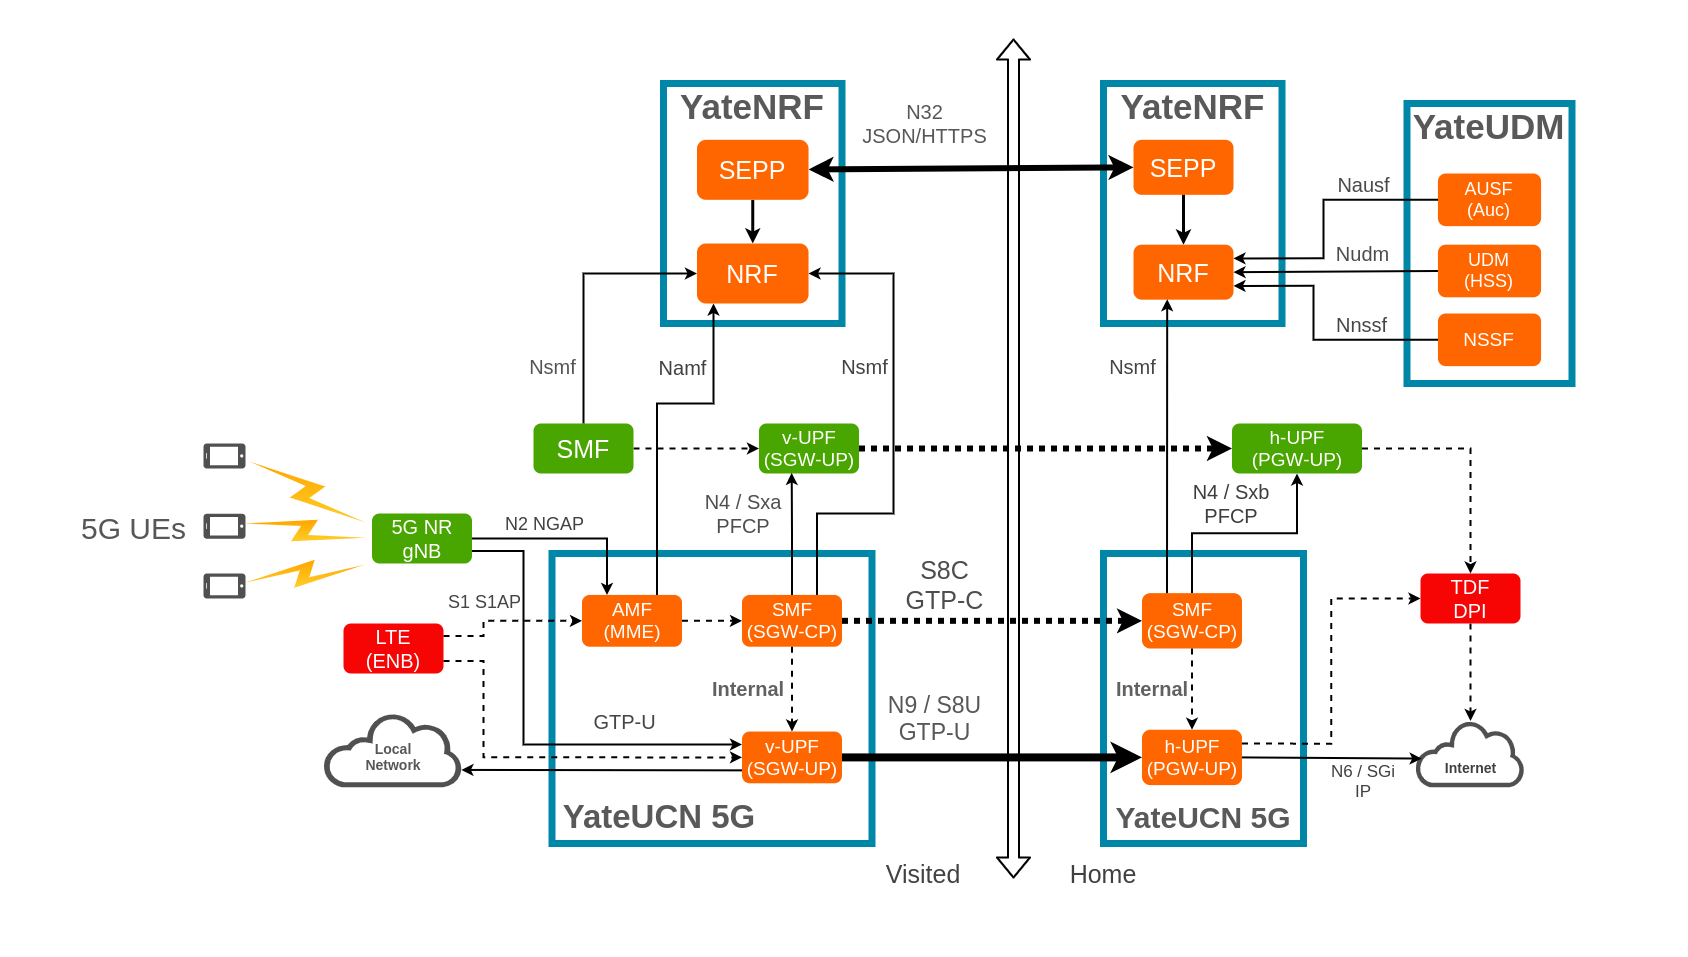 5G Core Network 15